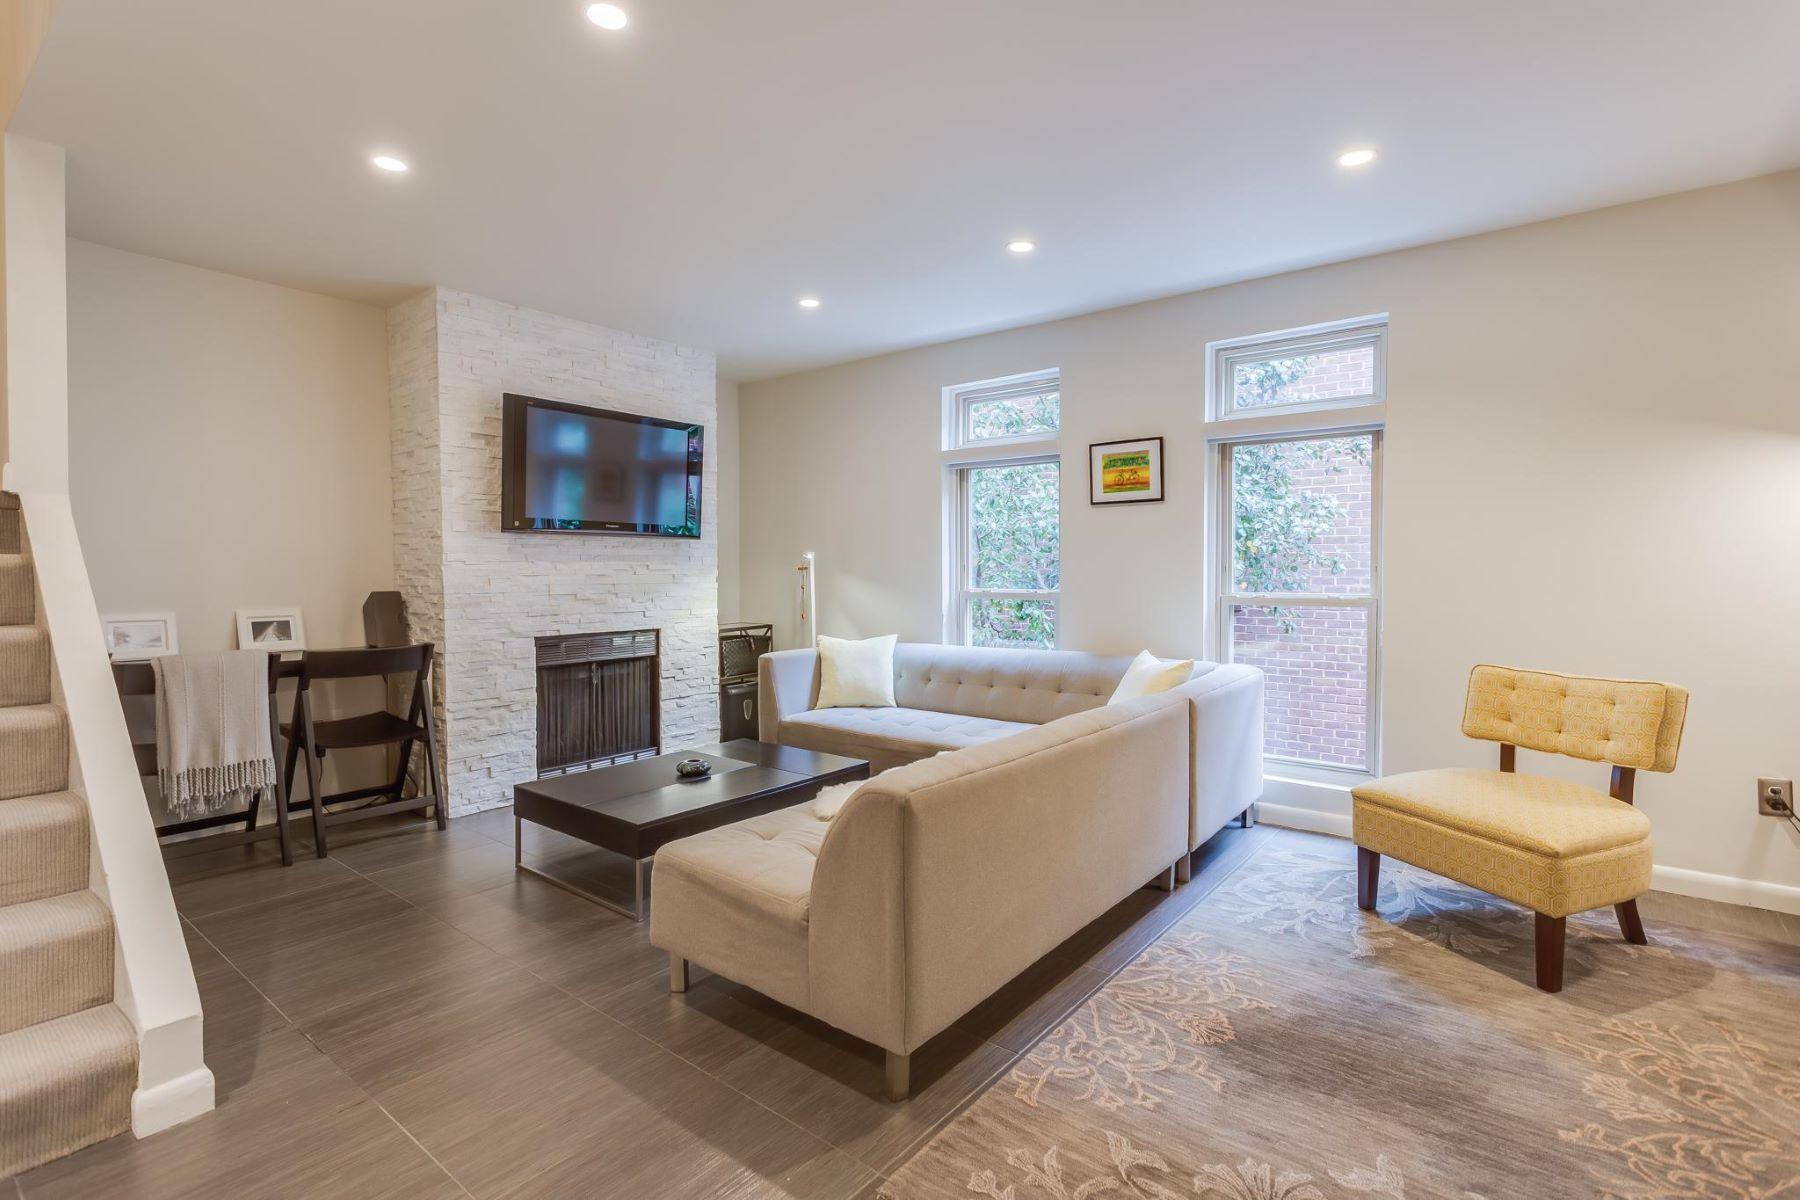 Condominium for Sale at 1443 A St Ne #d 1443 A St Ne #d Washington, District Of Columbia 20002 United States